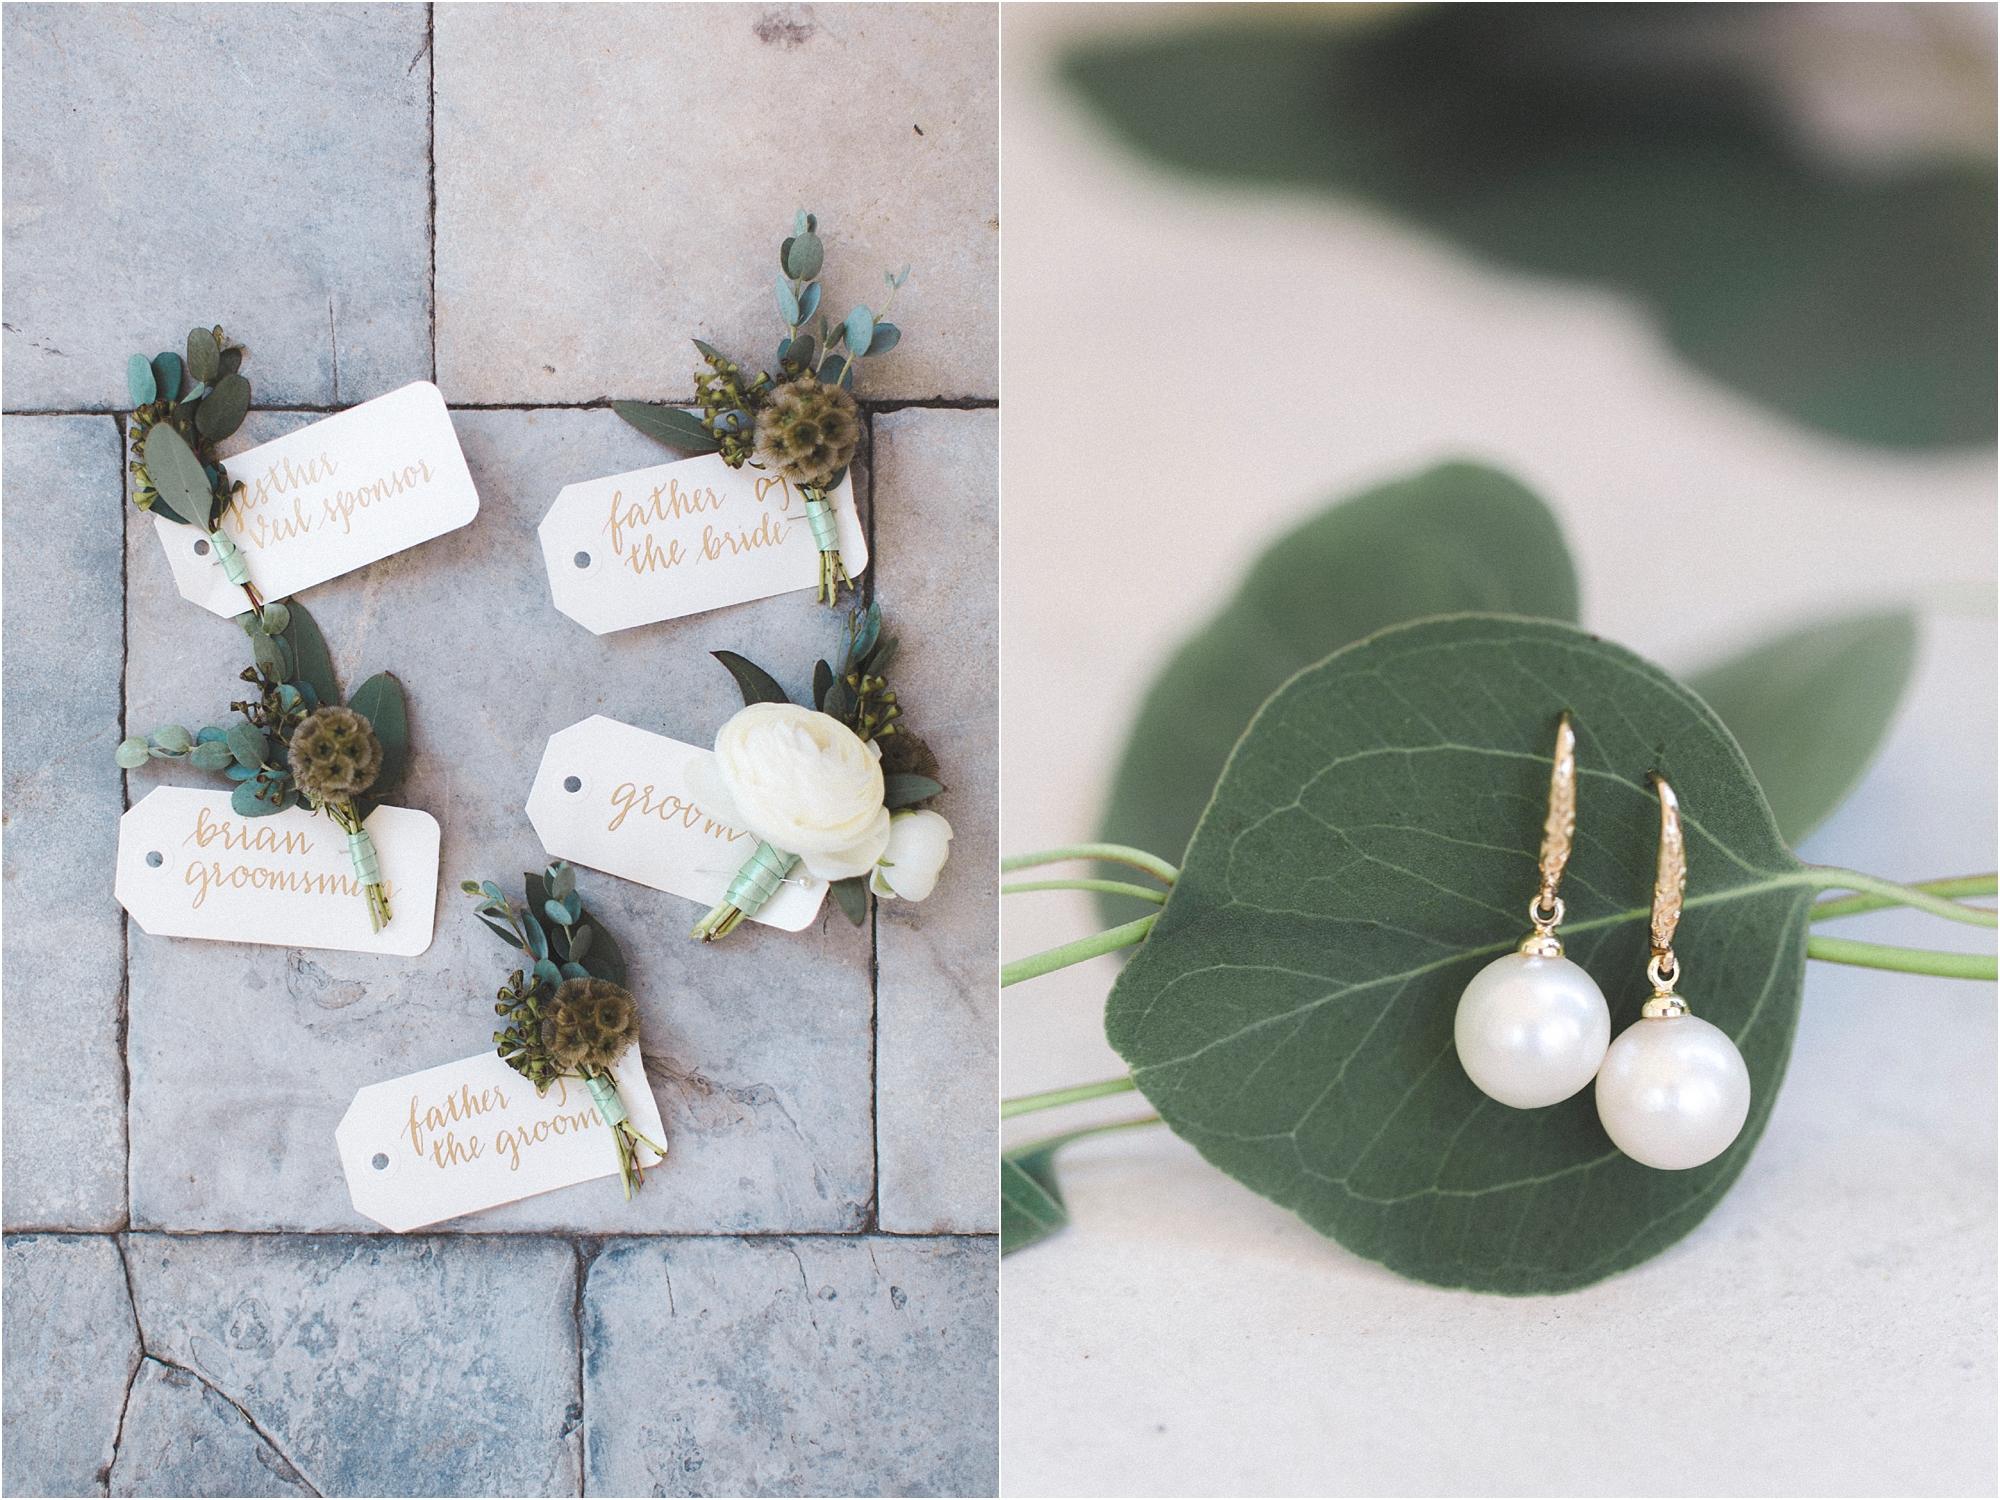 stephanie-yonce-photography-historic-church-virginia-museu-fine-arts-wedding-photos_014.JPG